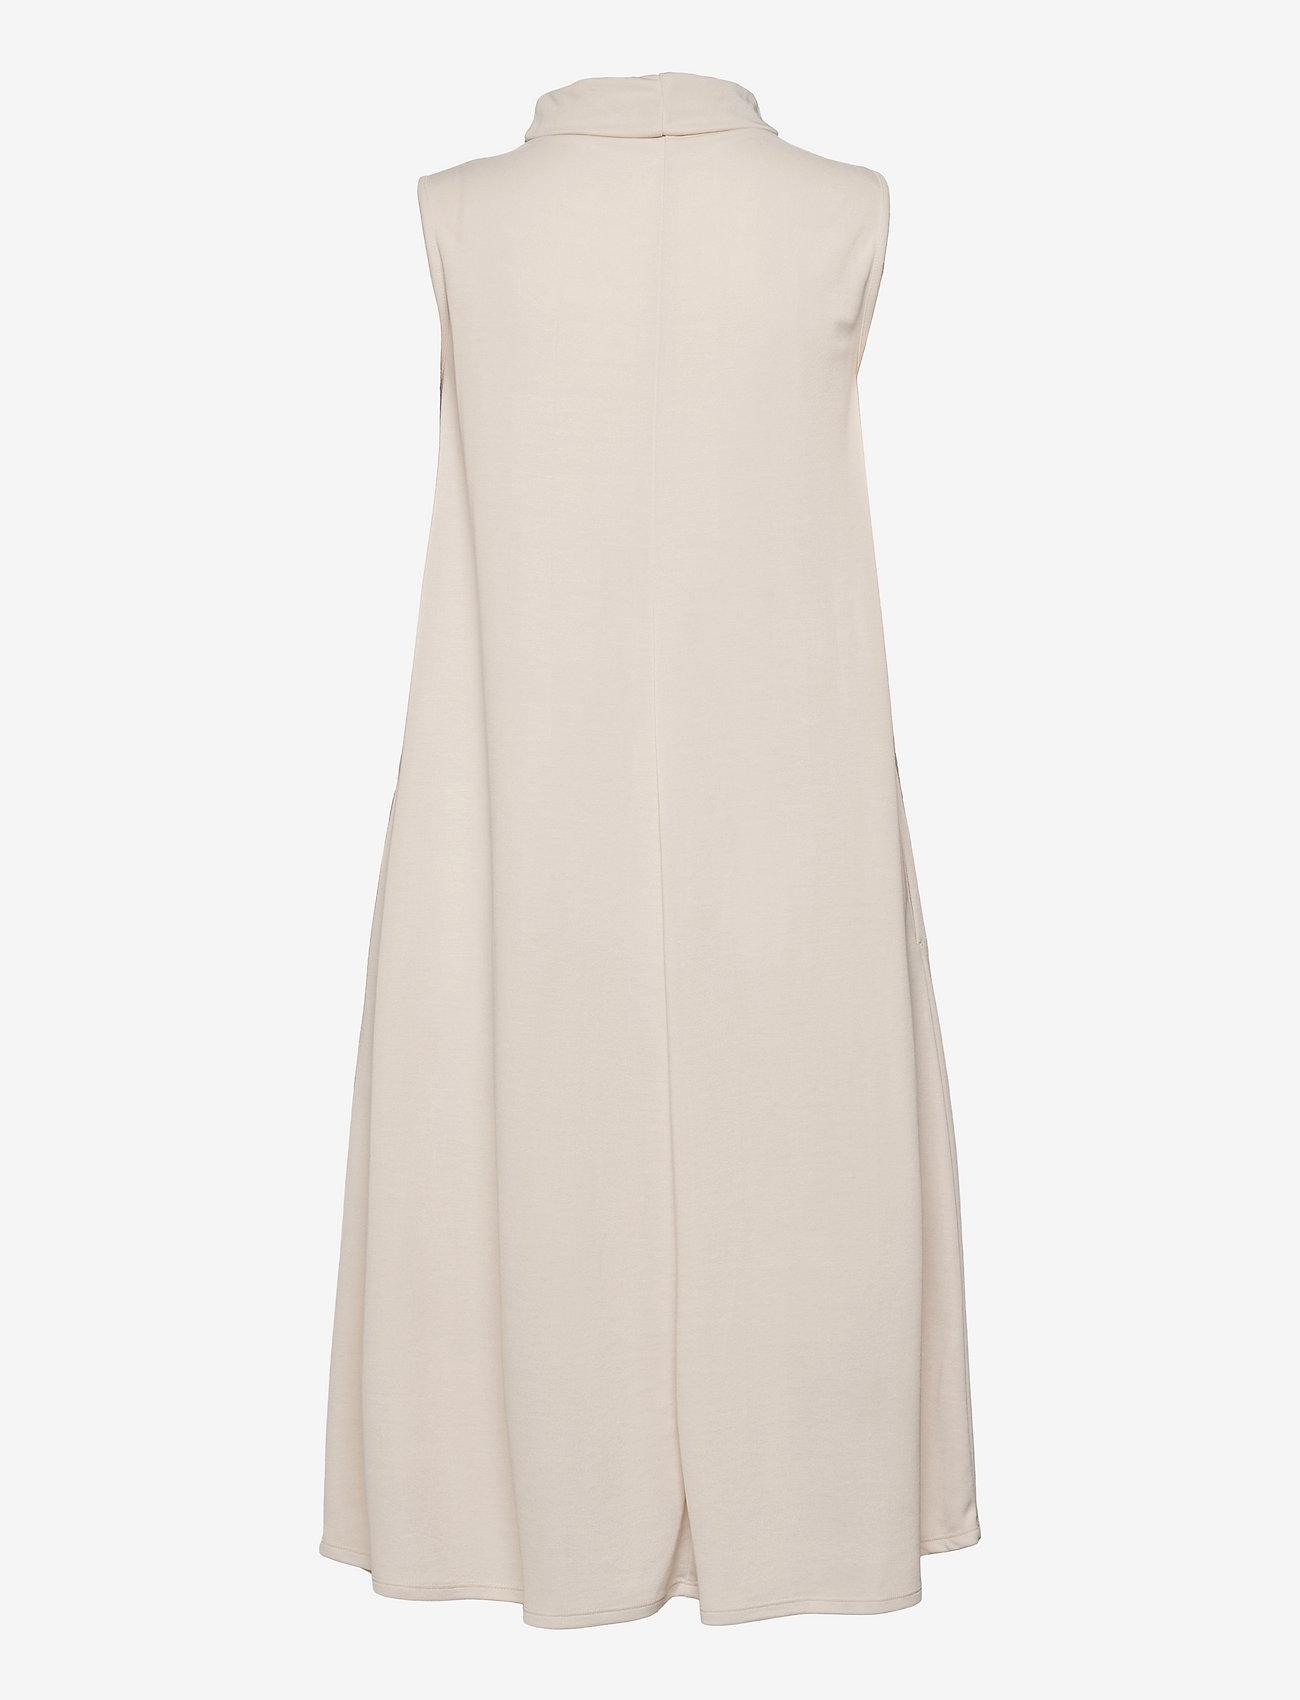 Max Mara Leisure - FANTINO - summer dresses - beige - 1